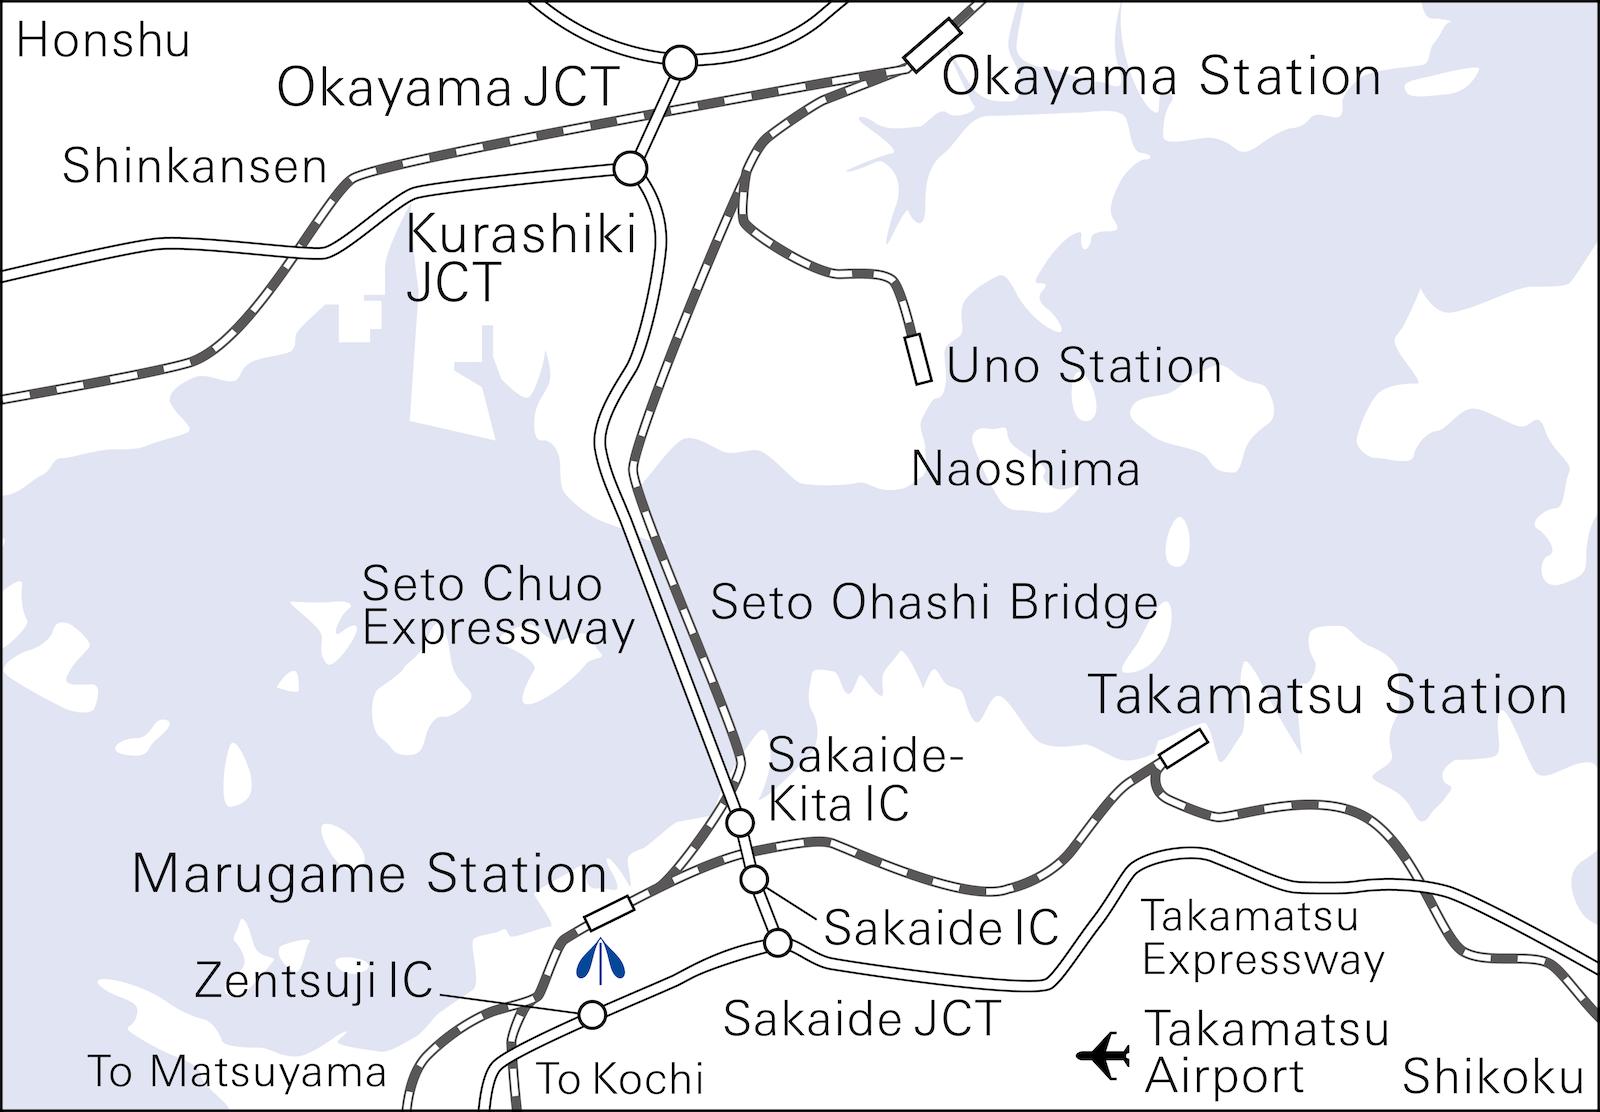 map2_en.png